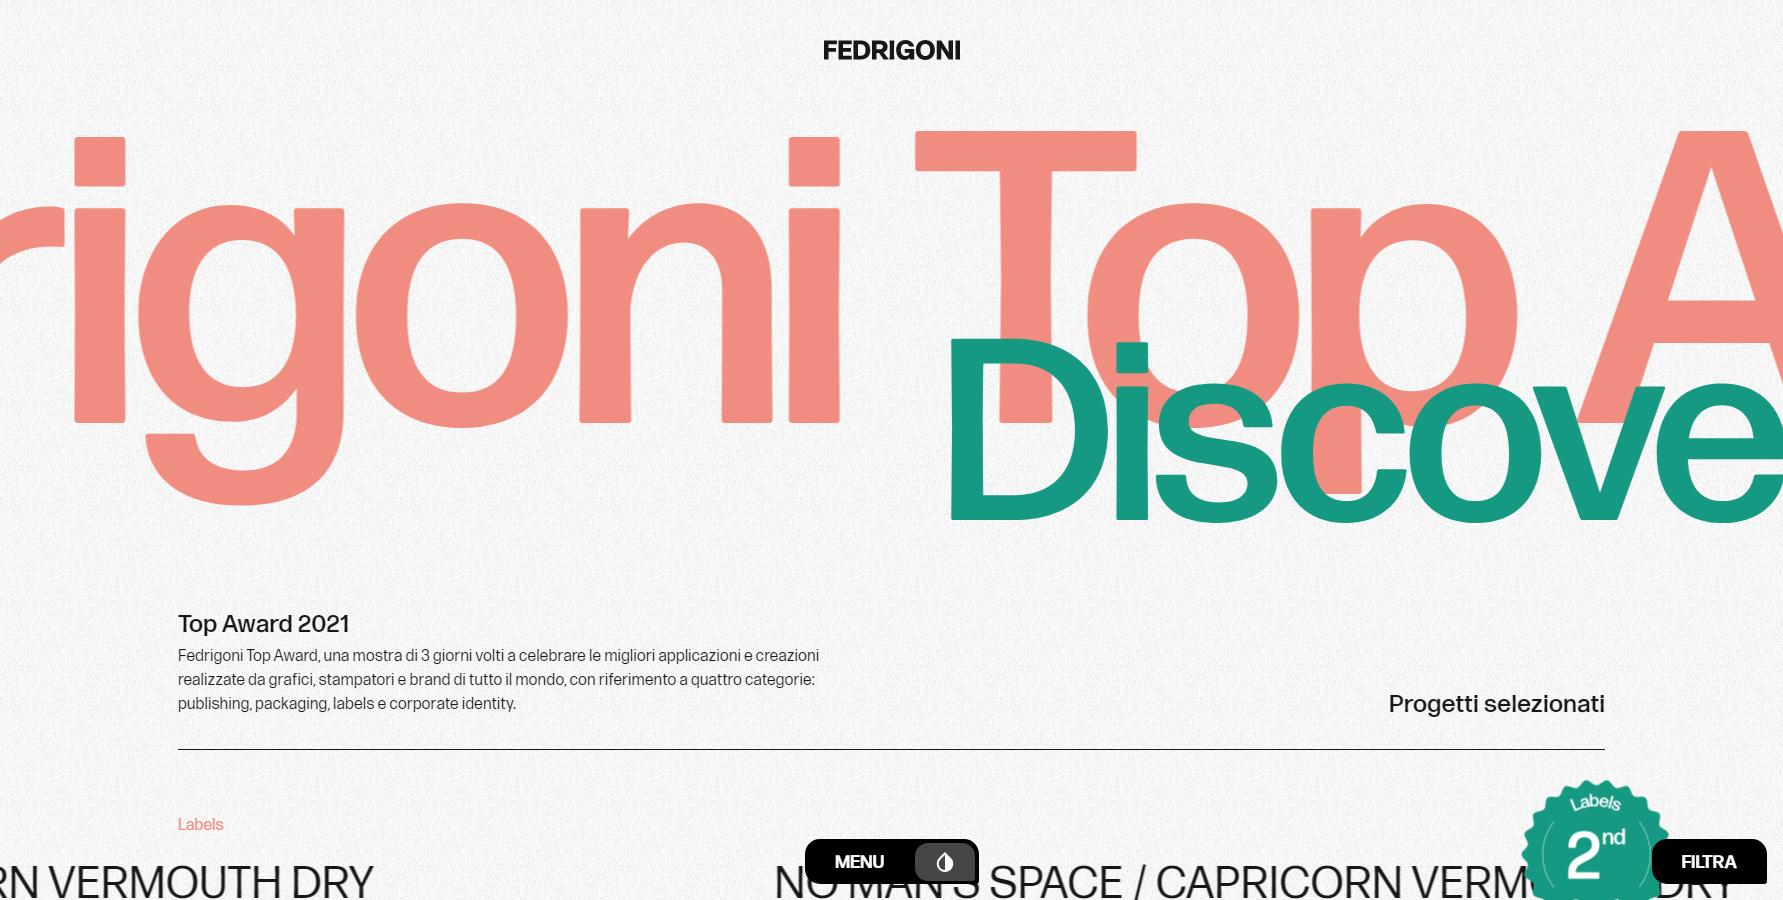 Fedrigoni Top Awards 2021 - Website of the Day